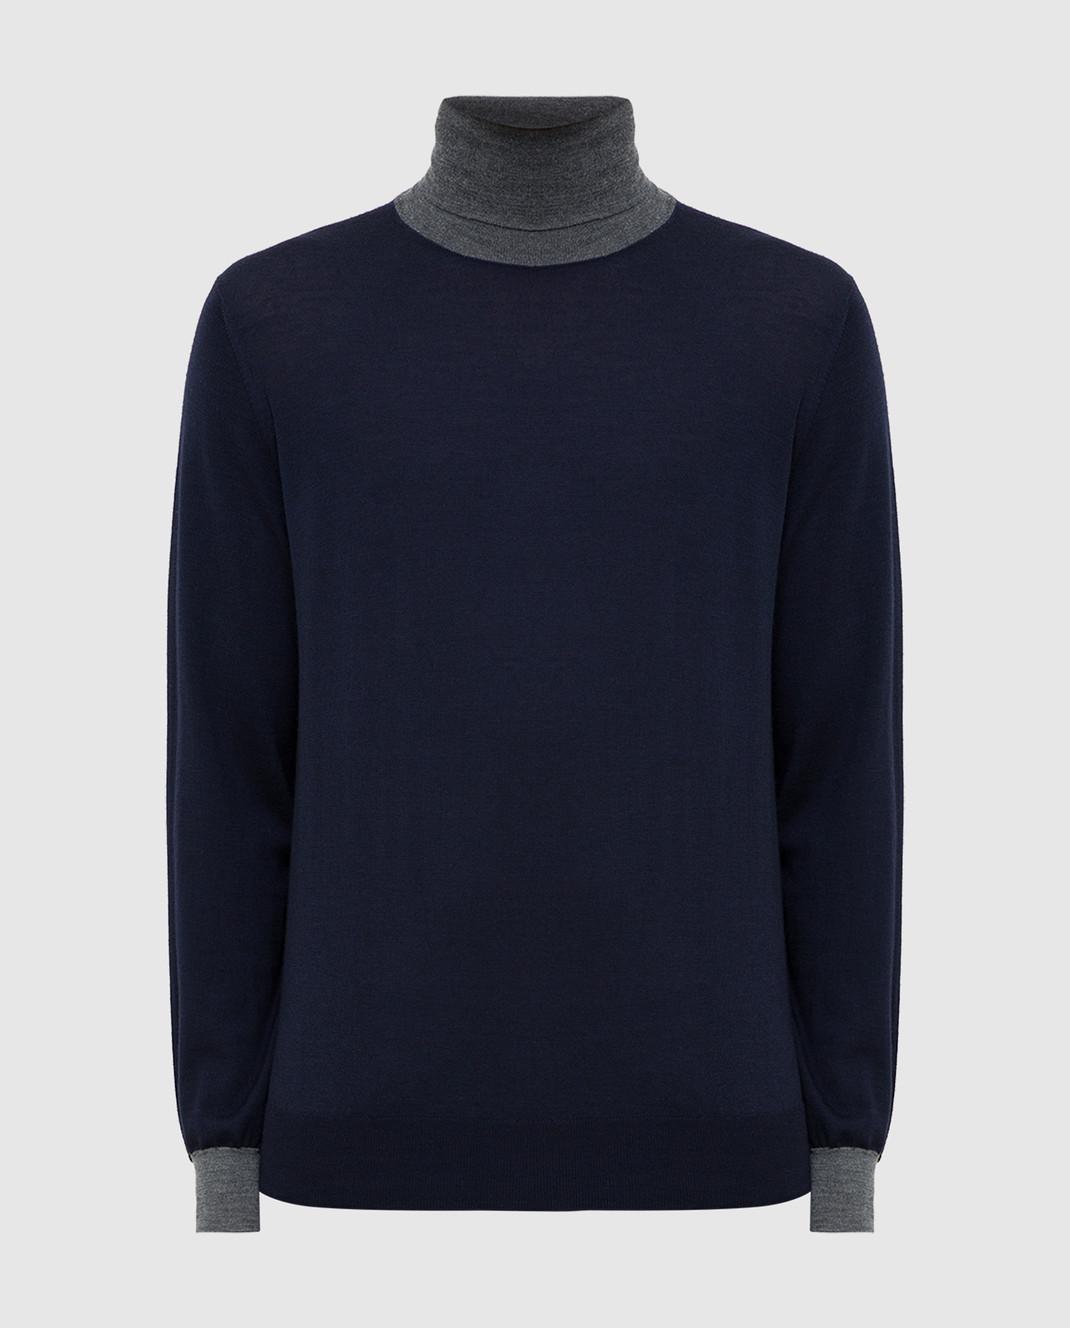 Brunello Cucinelli Темно-синий гольф из шерсти и кашемира M24801403